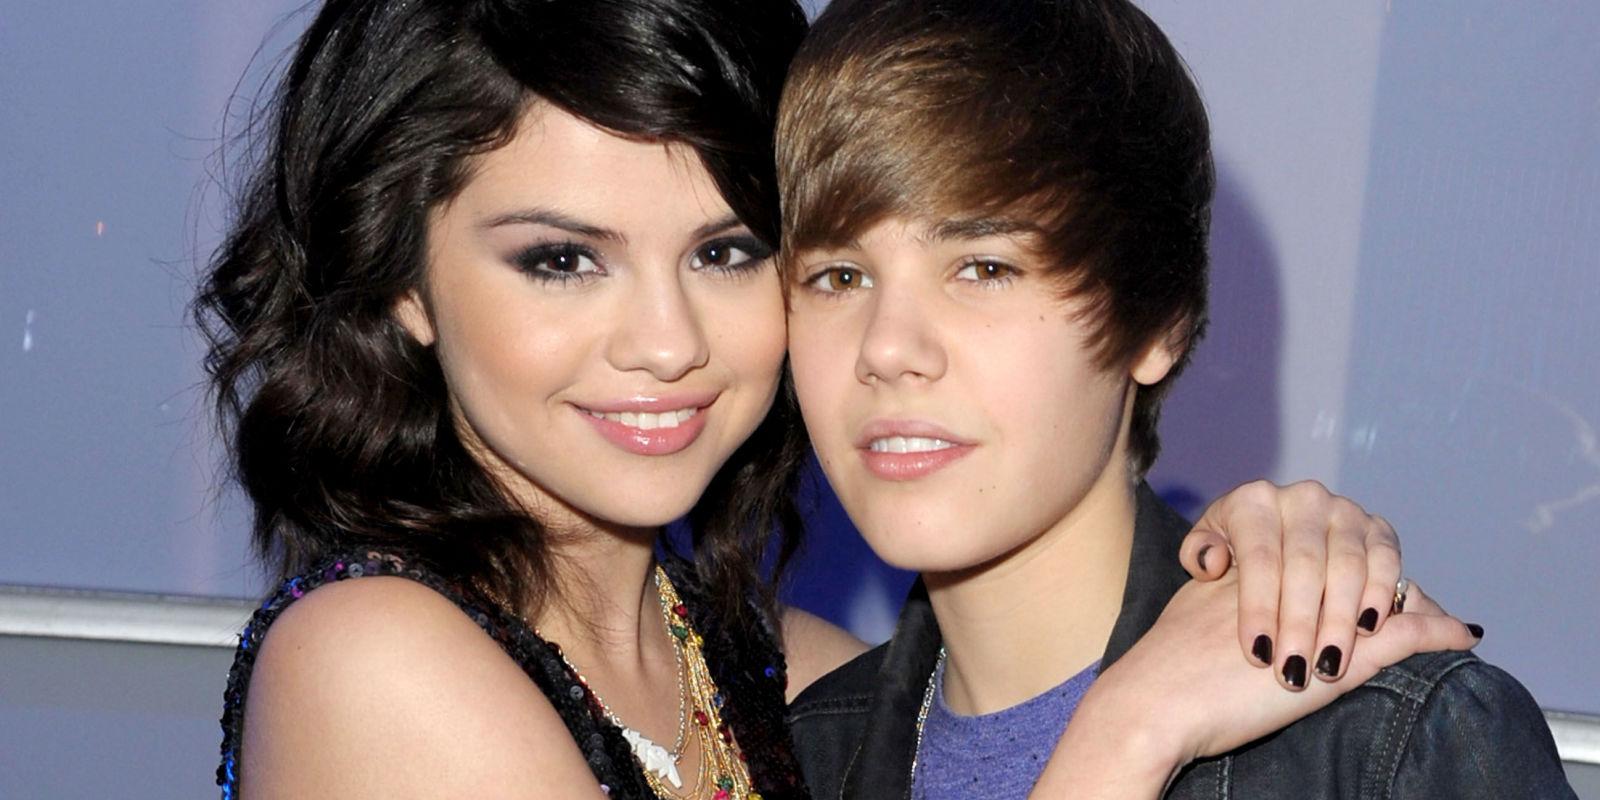 Uh, Selena Gomez has recorded a version of Justin Bieber ... Justin Bieber Selena Gomez 2009